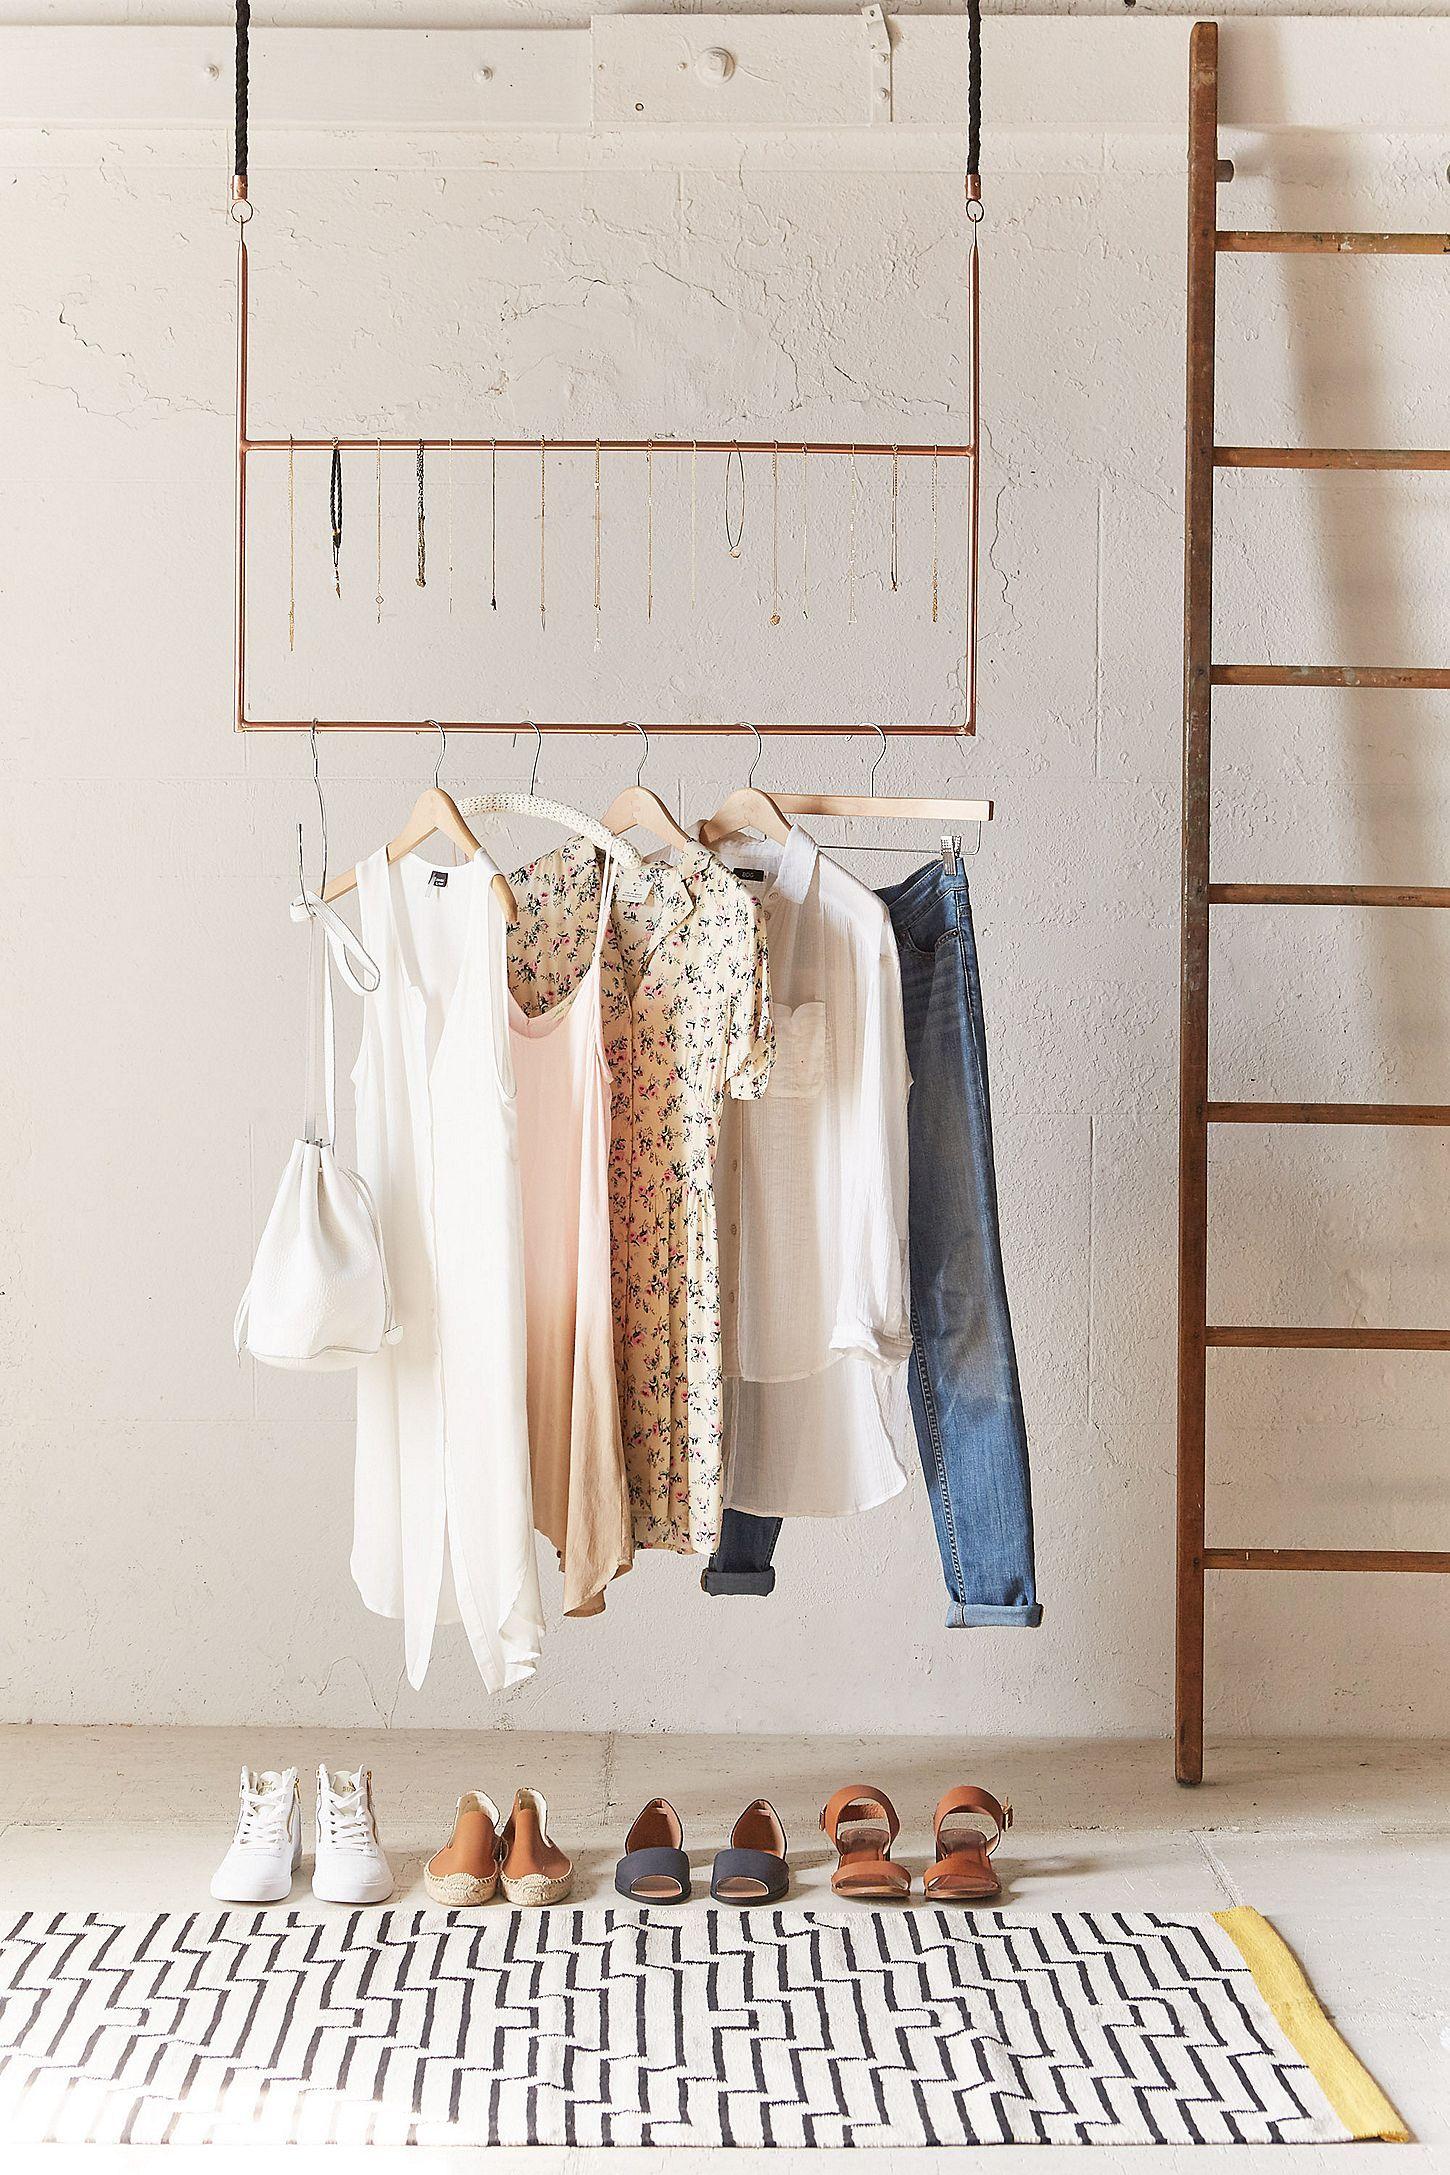 Ceiling Clothing Rack   Clothing rack